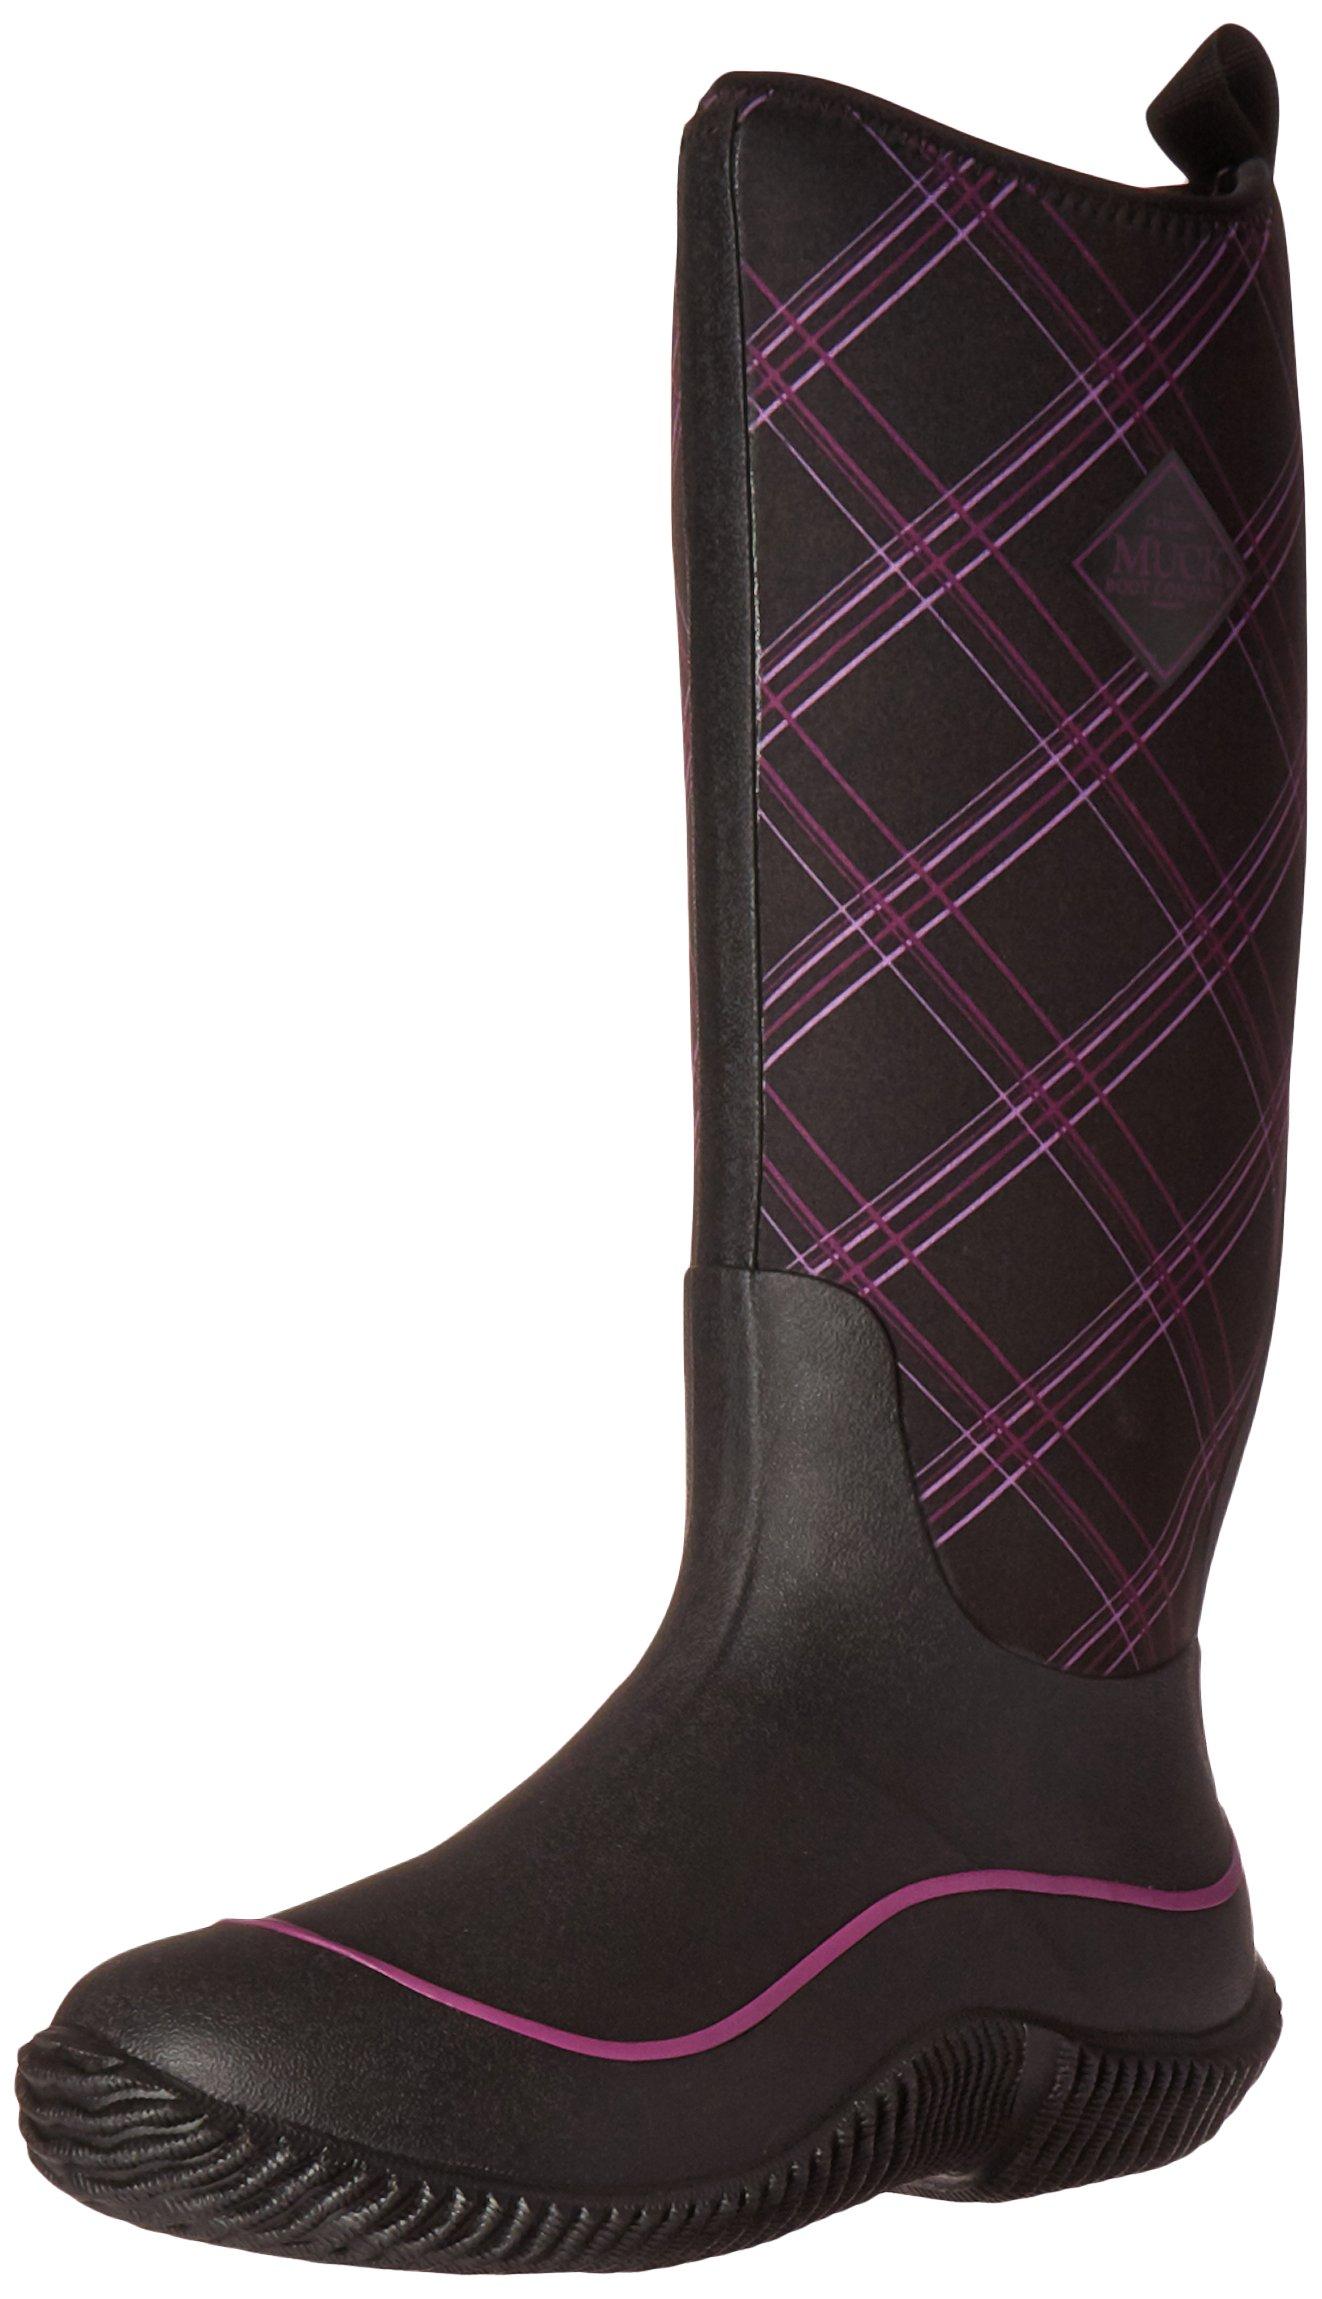 Muck Boots Hale Multi-Season Women's Rubber Boot, Black/Purple Plaid, 10 M US